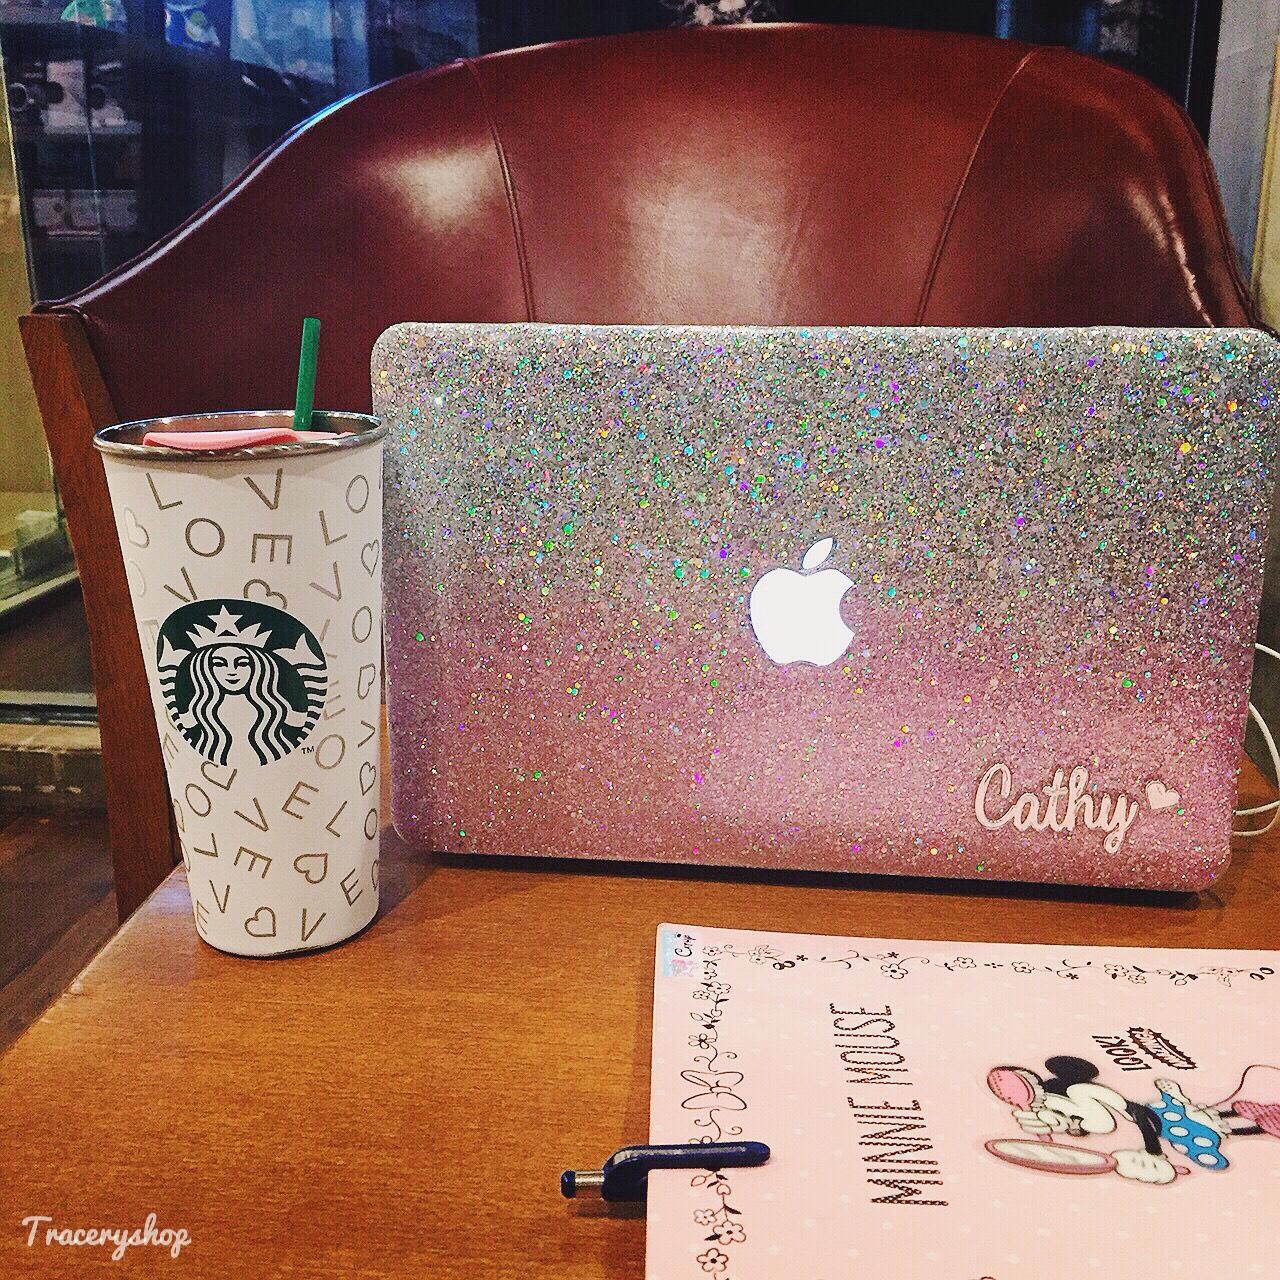 Macbook,Macbookcase,MacBookPro,Macbookair,Macbookretina,glitter,Glittercase,เคสกลิตเตอร์,เคสกากเพชร,เคสแม็คบุ๊ค,Macbookglittercase,Hologram,traceryshop,Pink,Galaxy